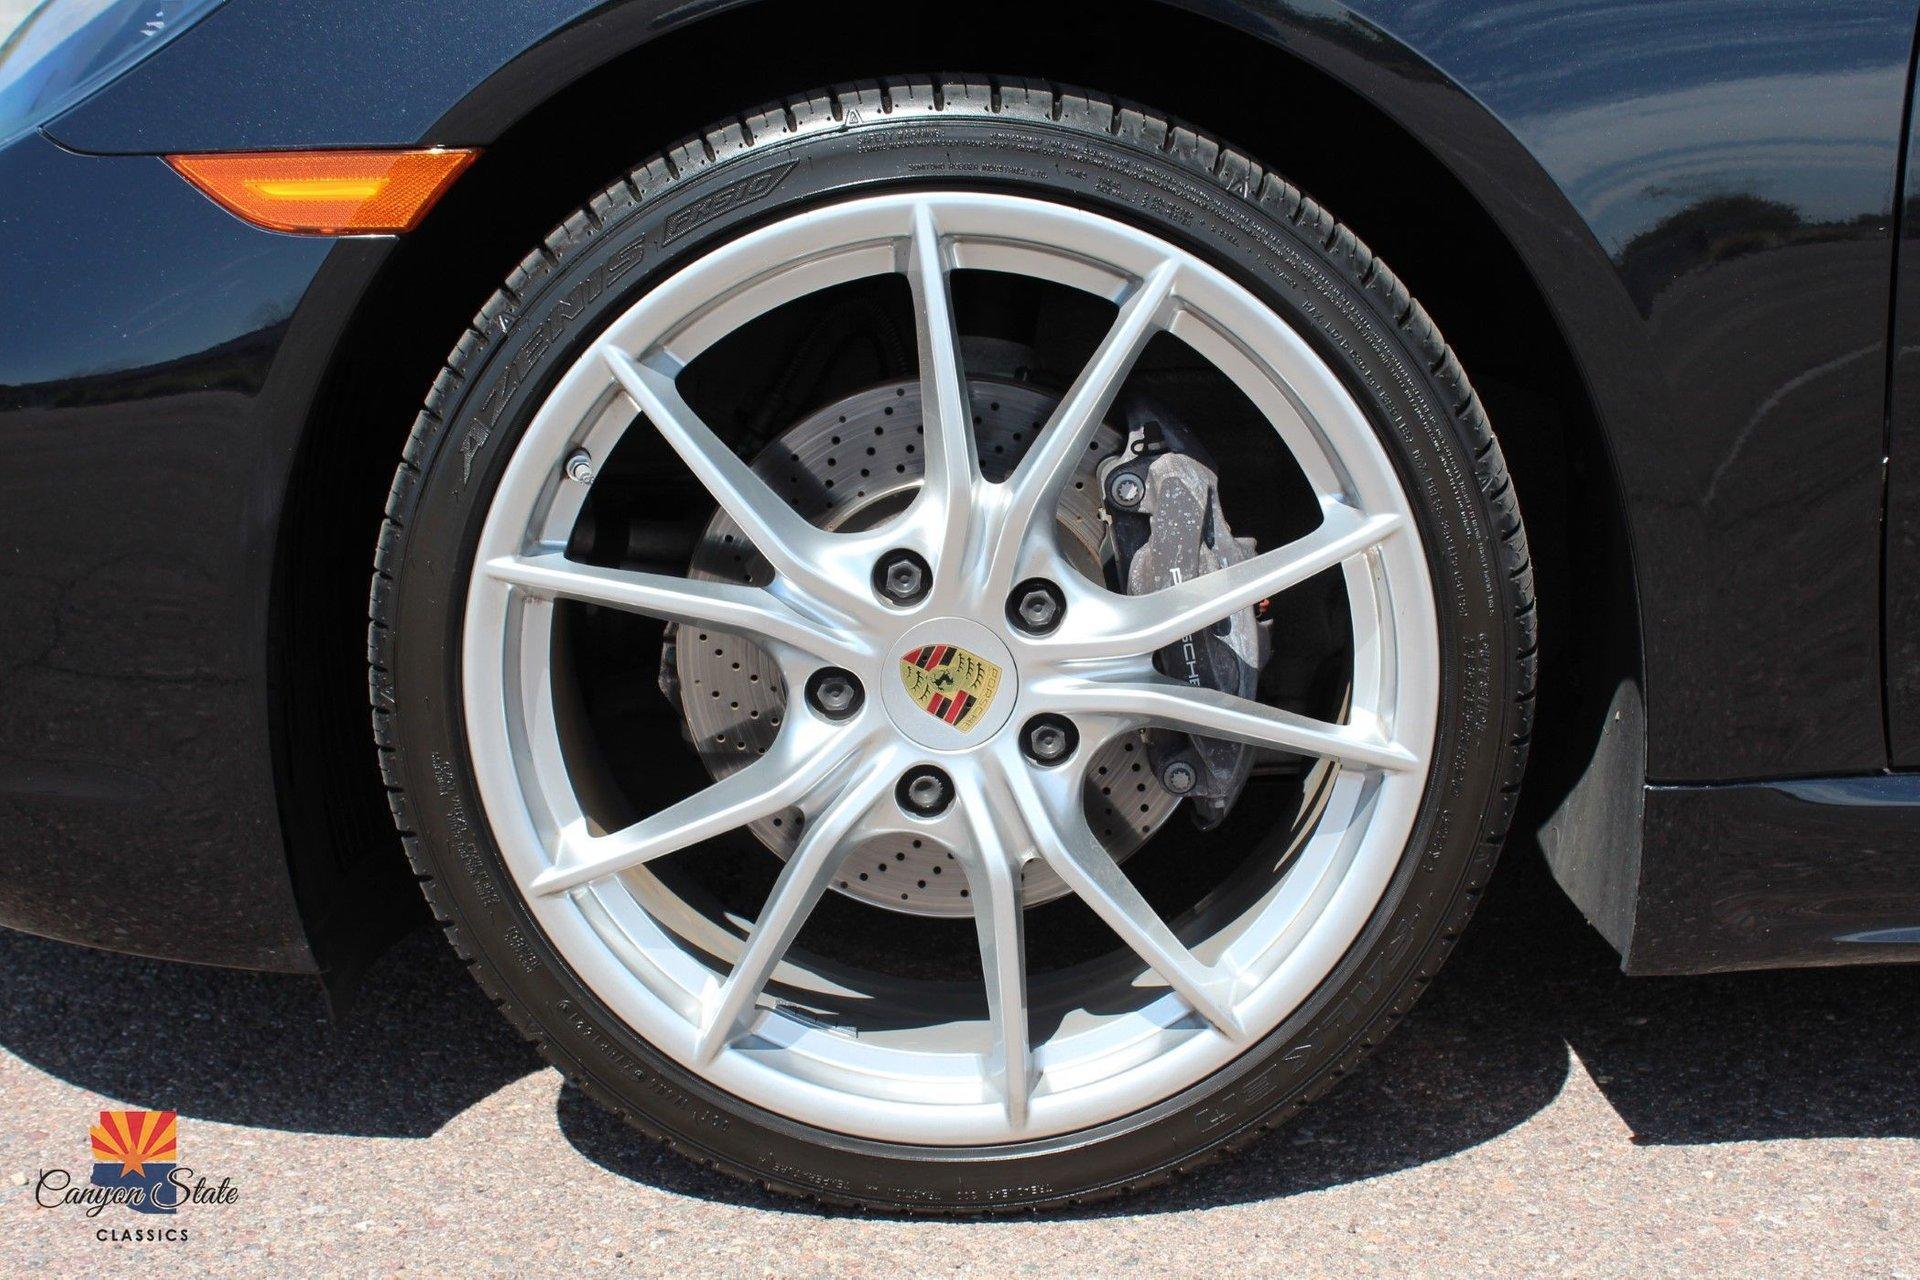 2018 Porsche 718 Cayman Coupe - Canyon State Classics